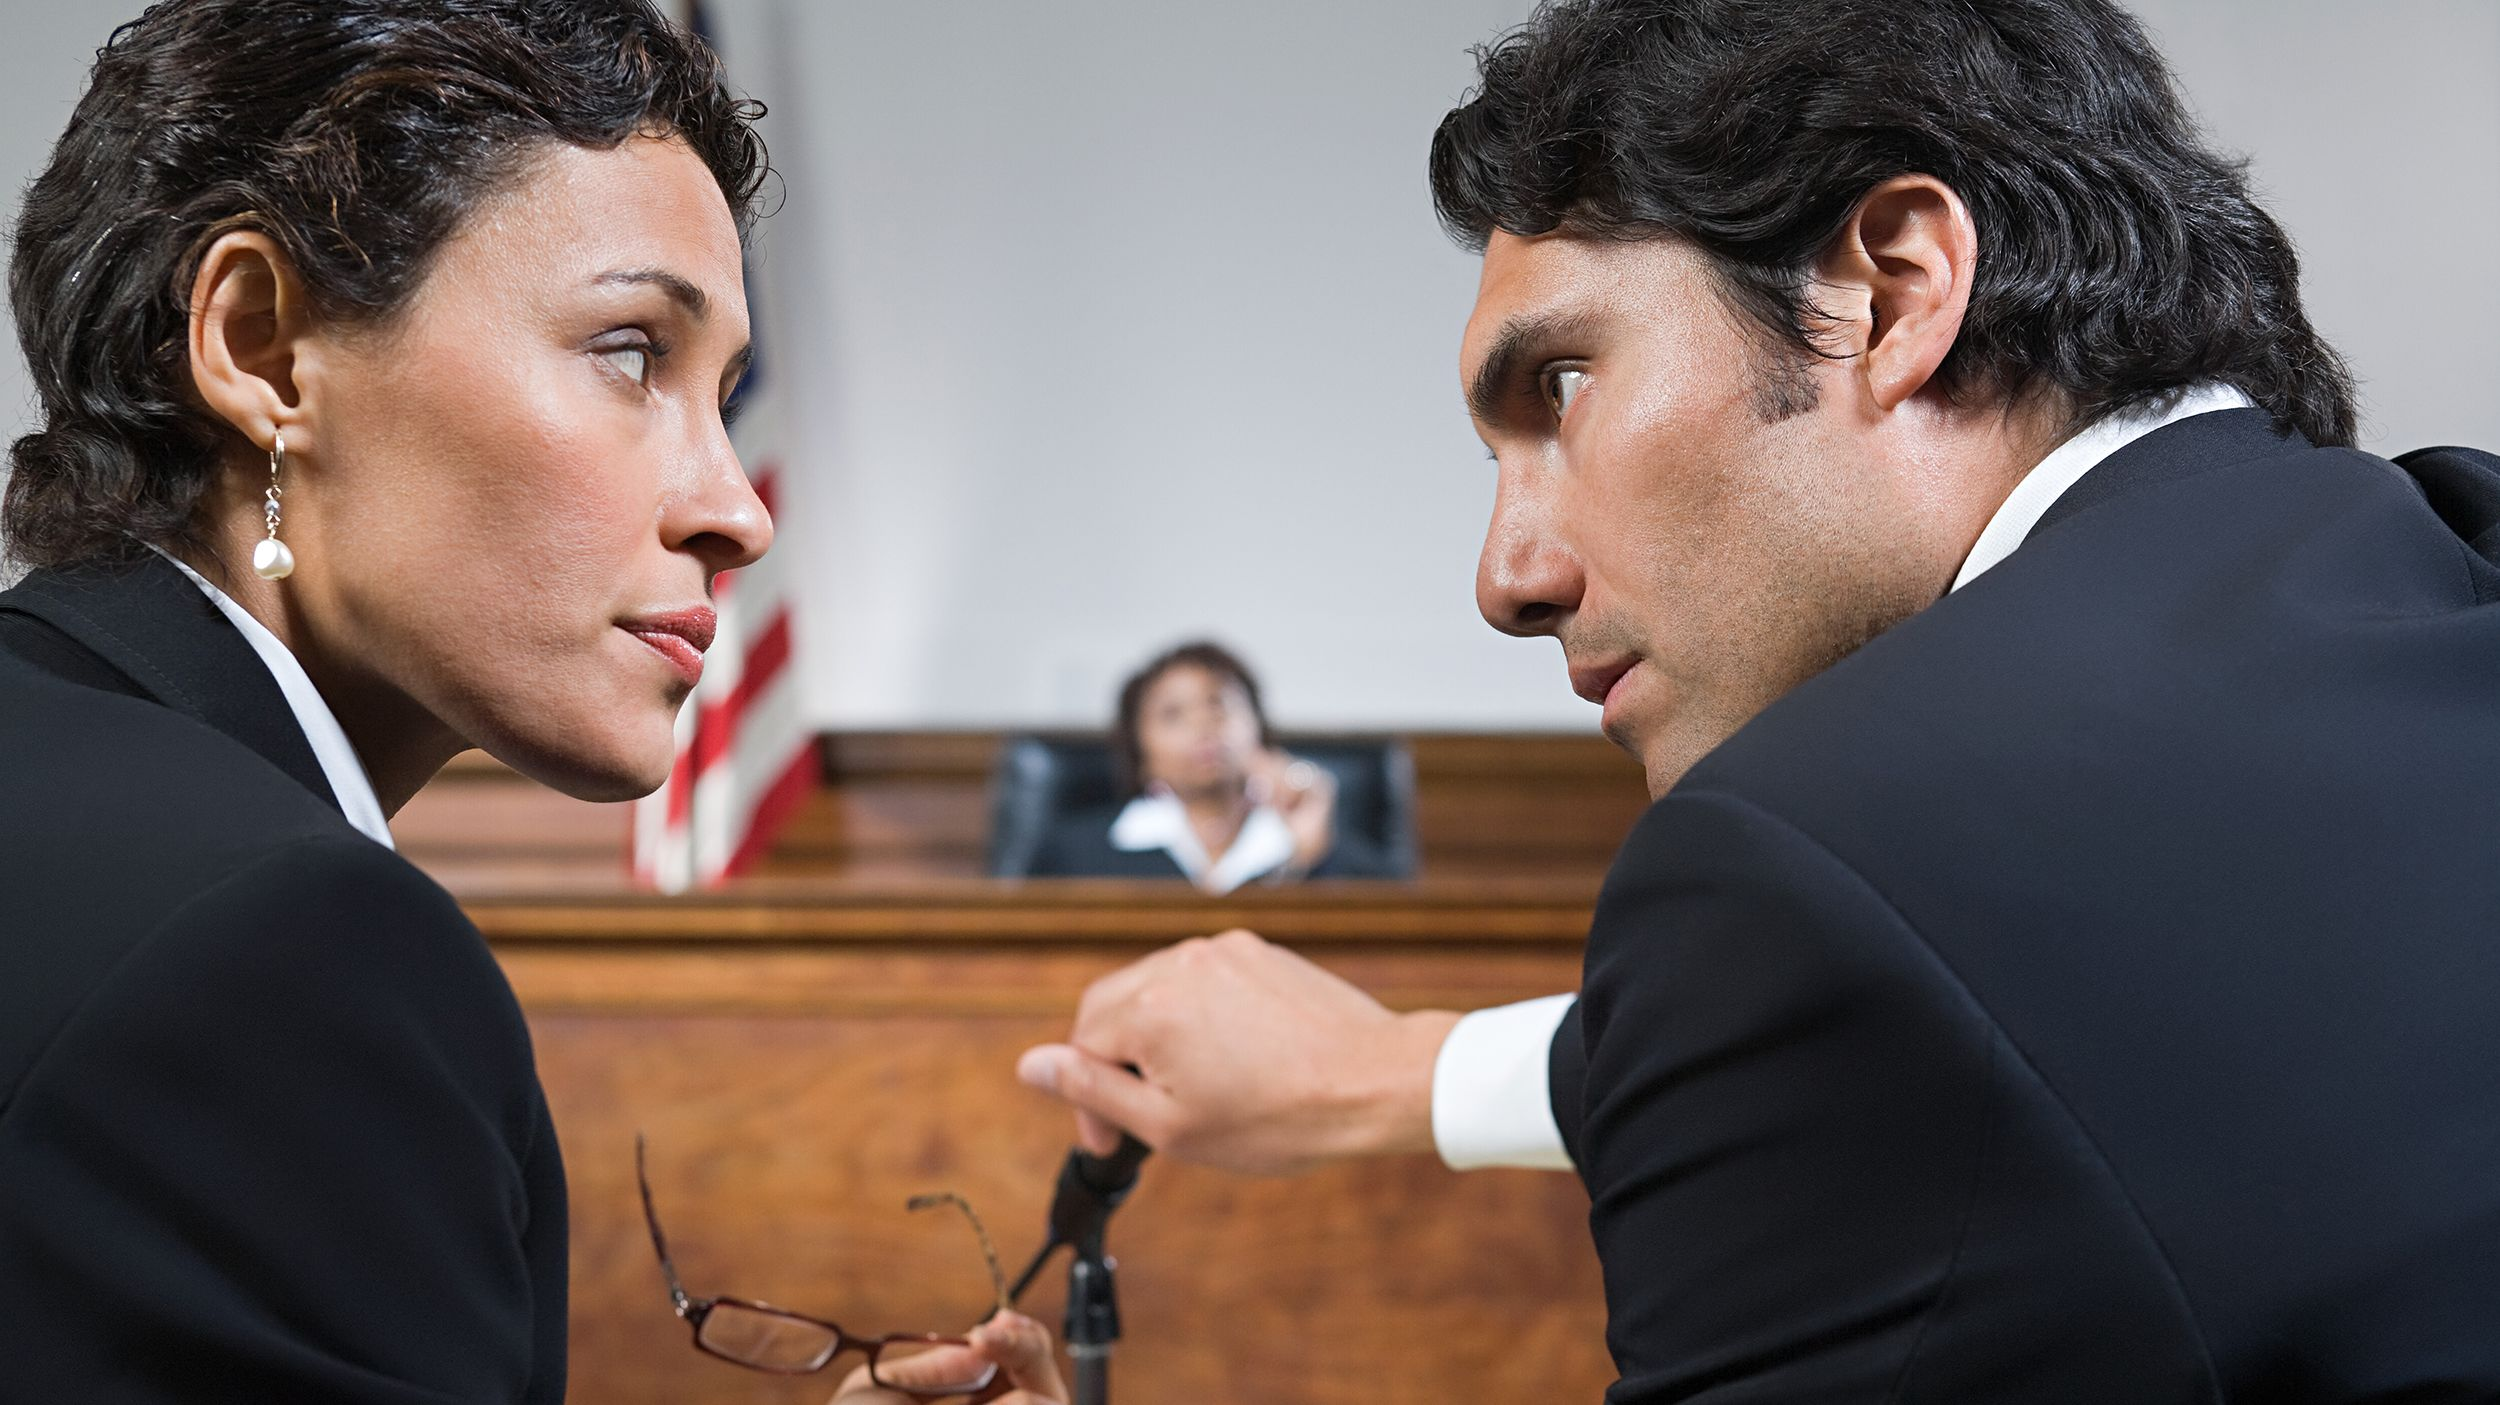 18 Secrets of Criminal Defense Attorneys | Mental Floss